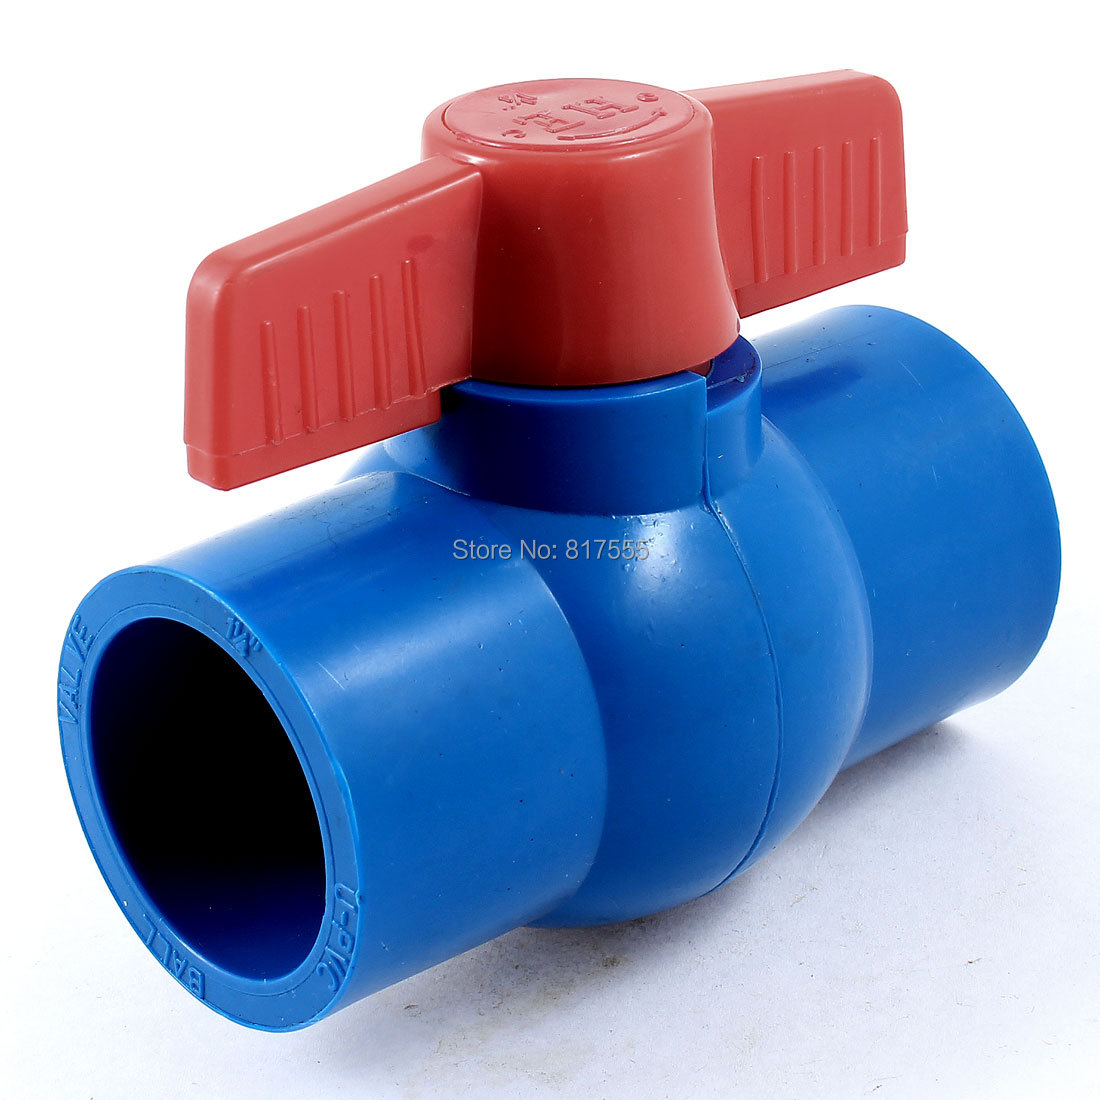 Achetez en gros vanne bille en pvc en ligne des grossistes vanne bille en pvc chinois - Comment decoller un tuyau pvc ...